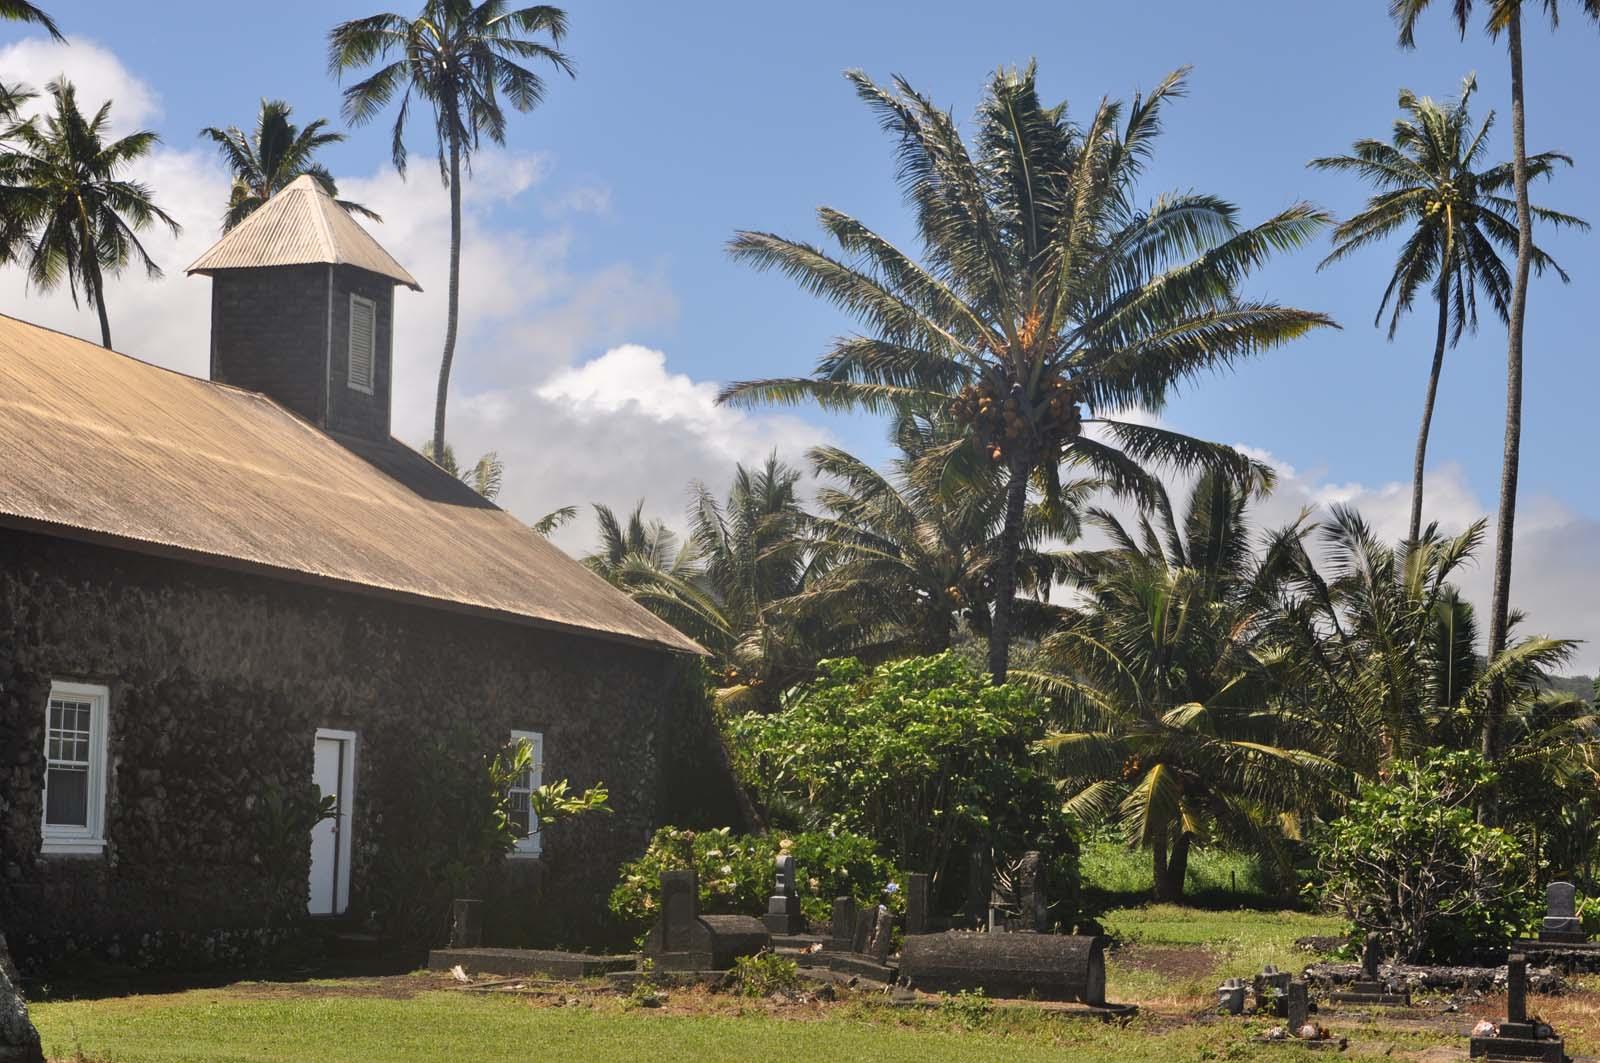 139_maui_hawaii_island